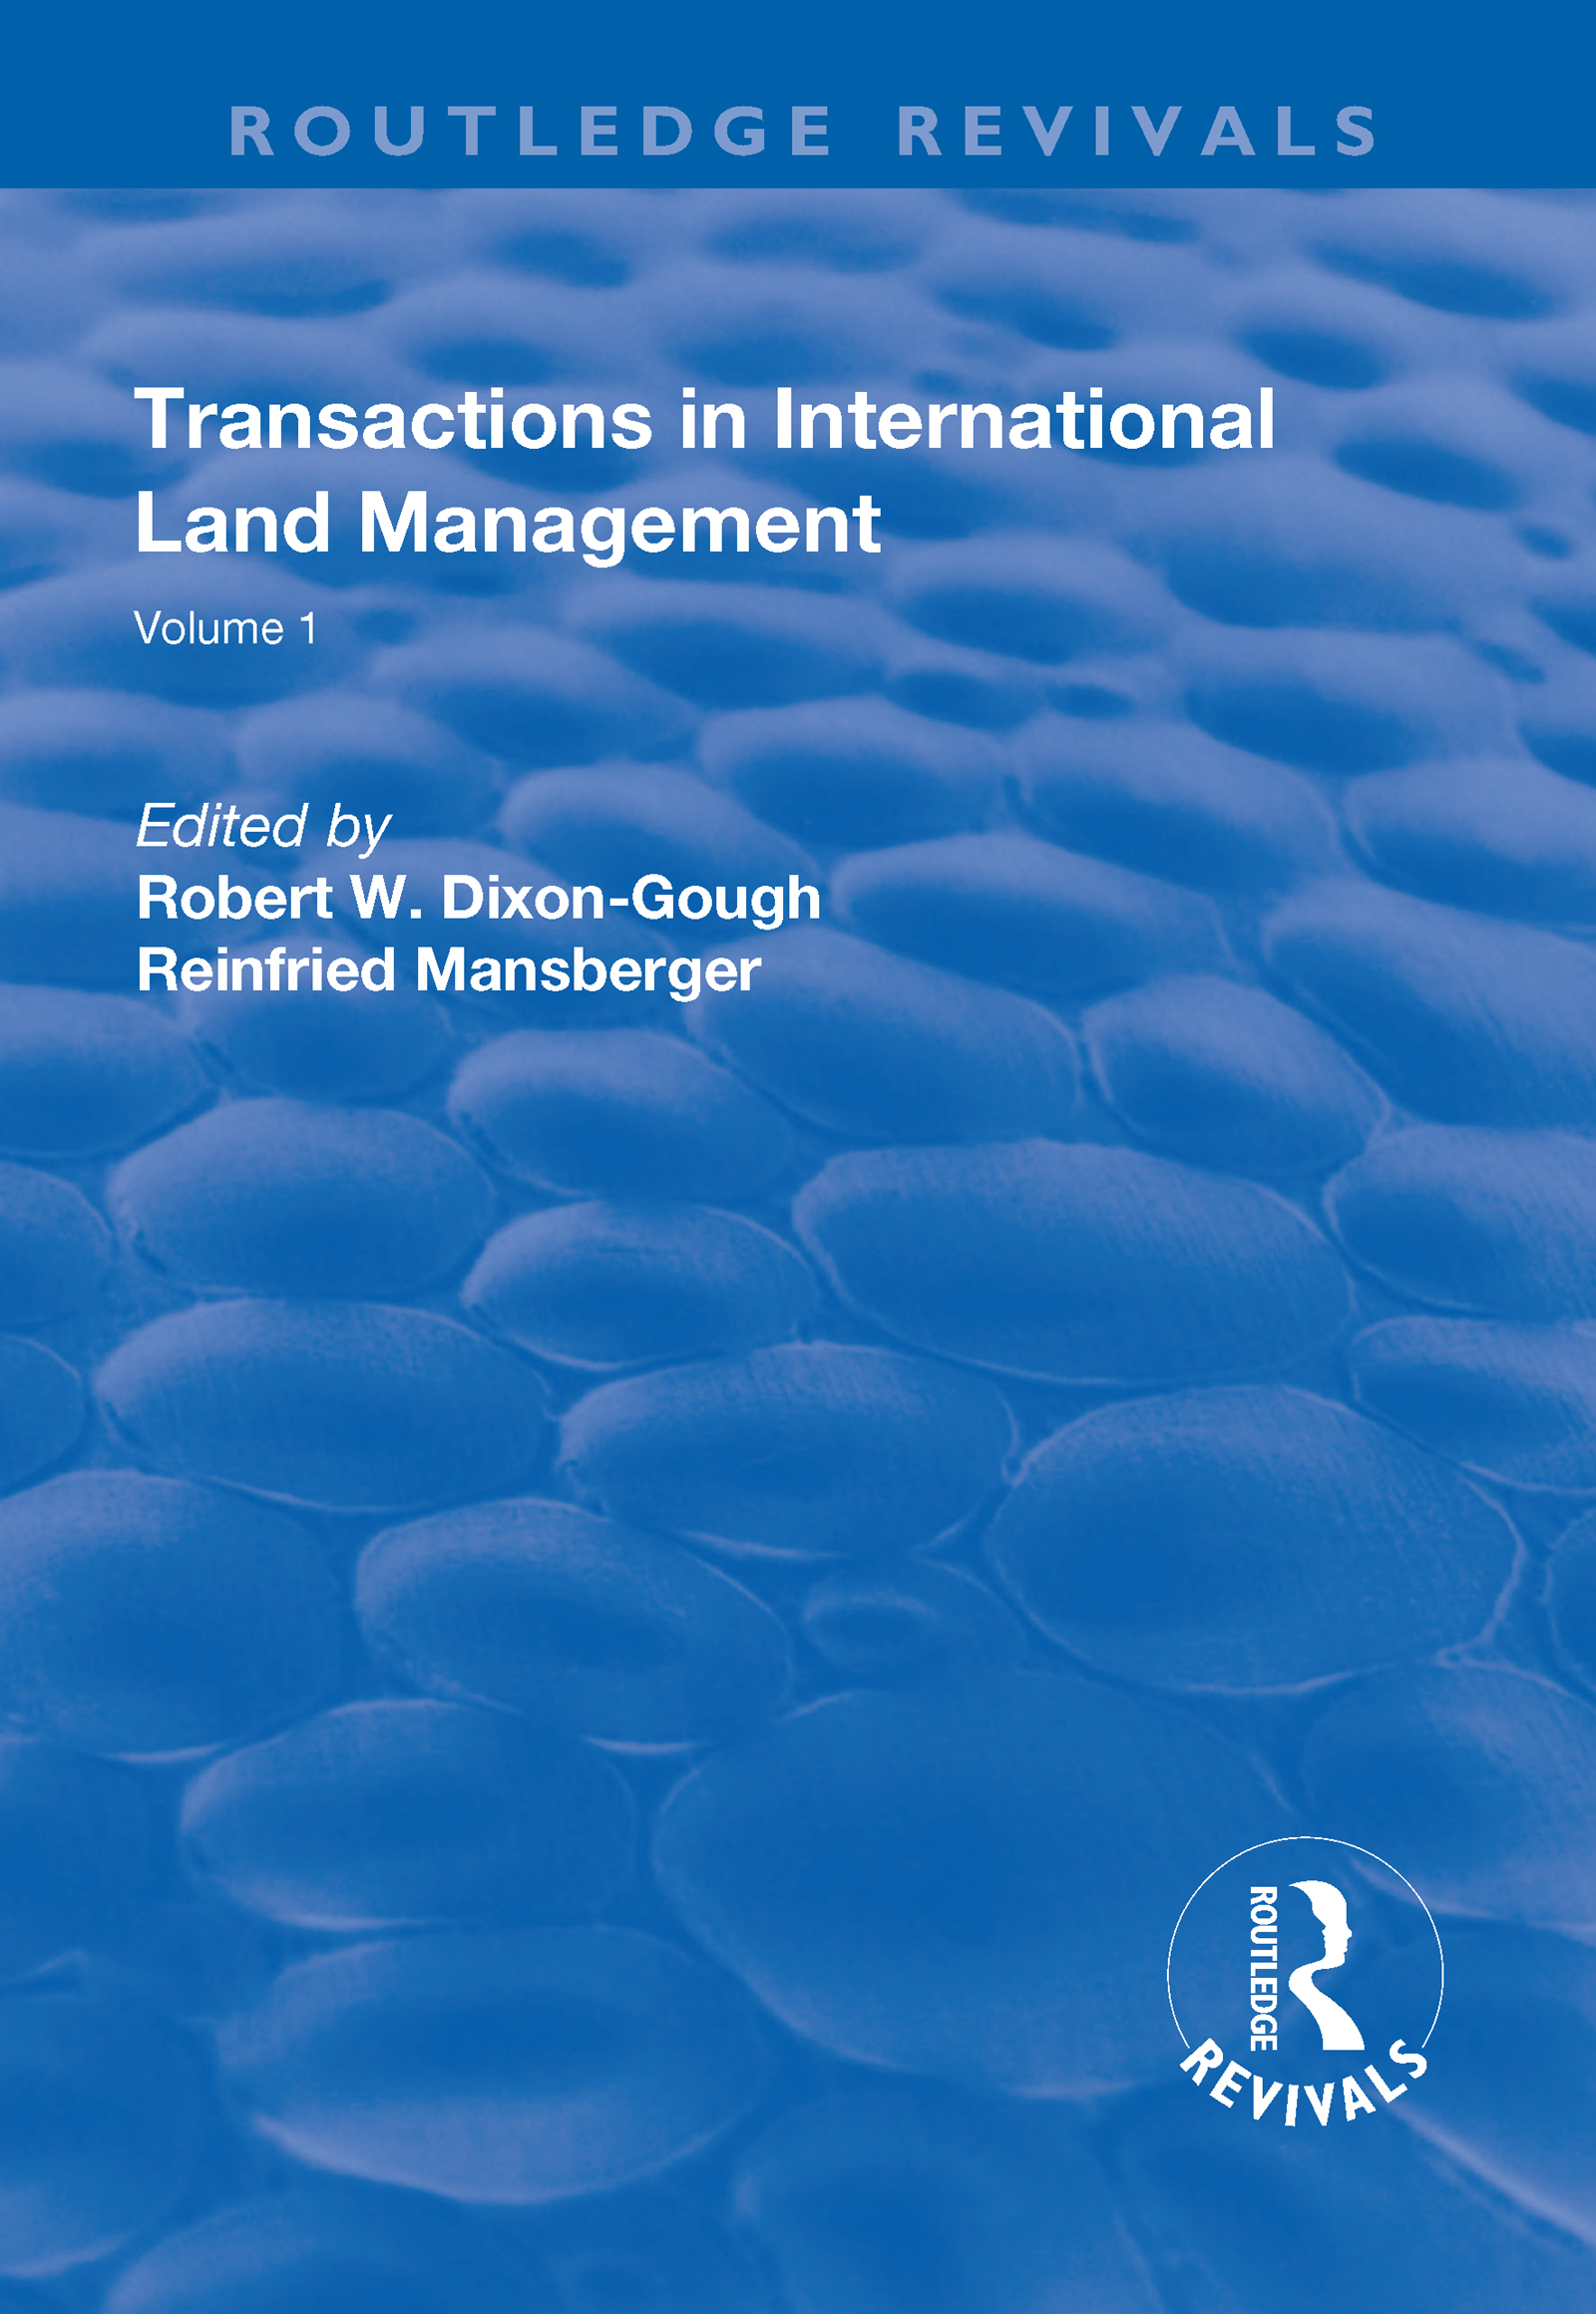 Transactions in International Land Management